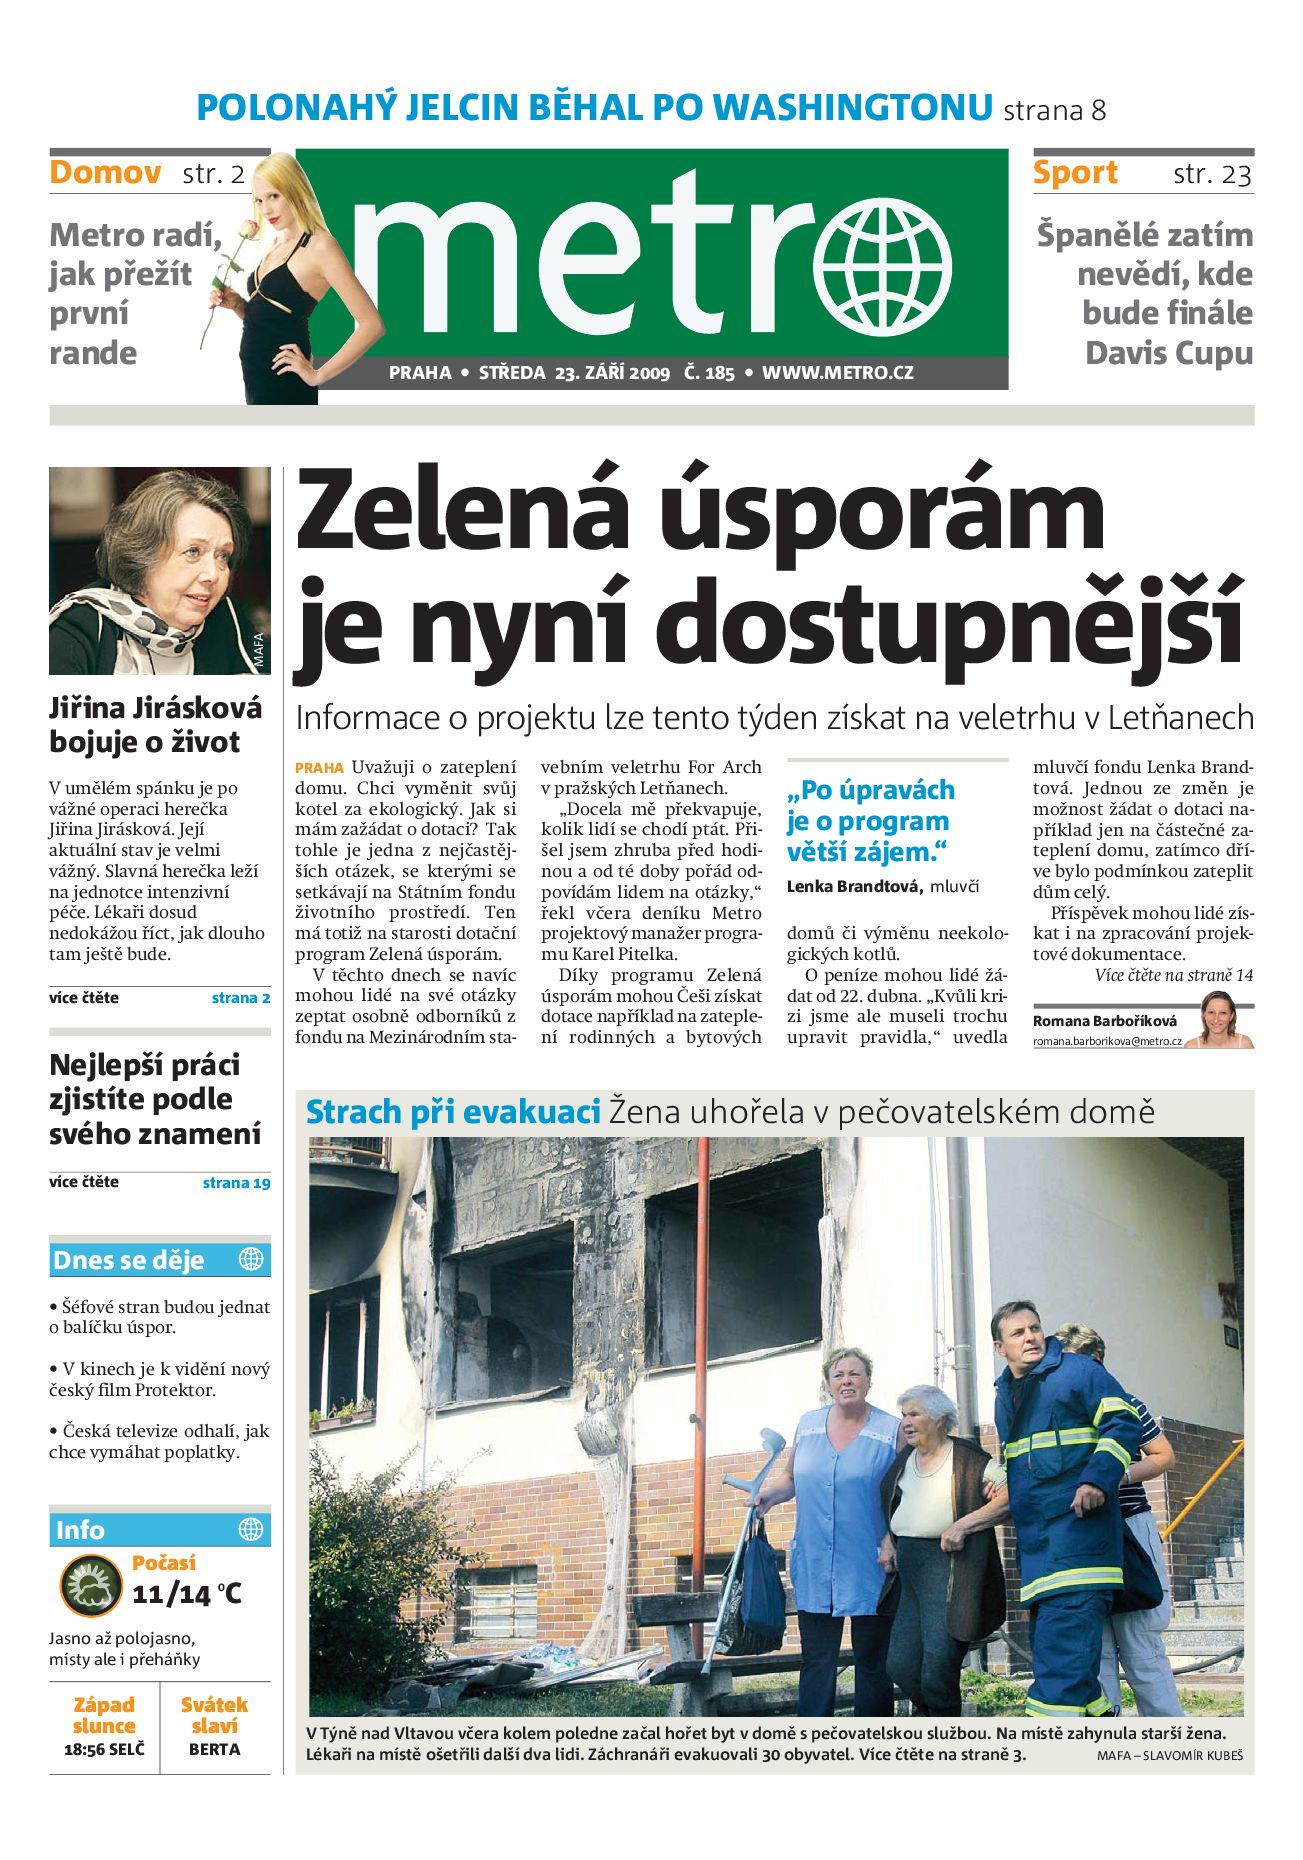 Uivatel senchakafe, ena, 32,5 let, Plze - seznamka sacicrm.info